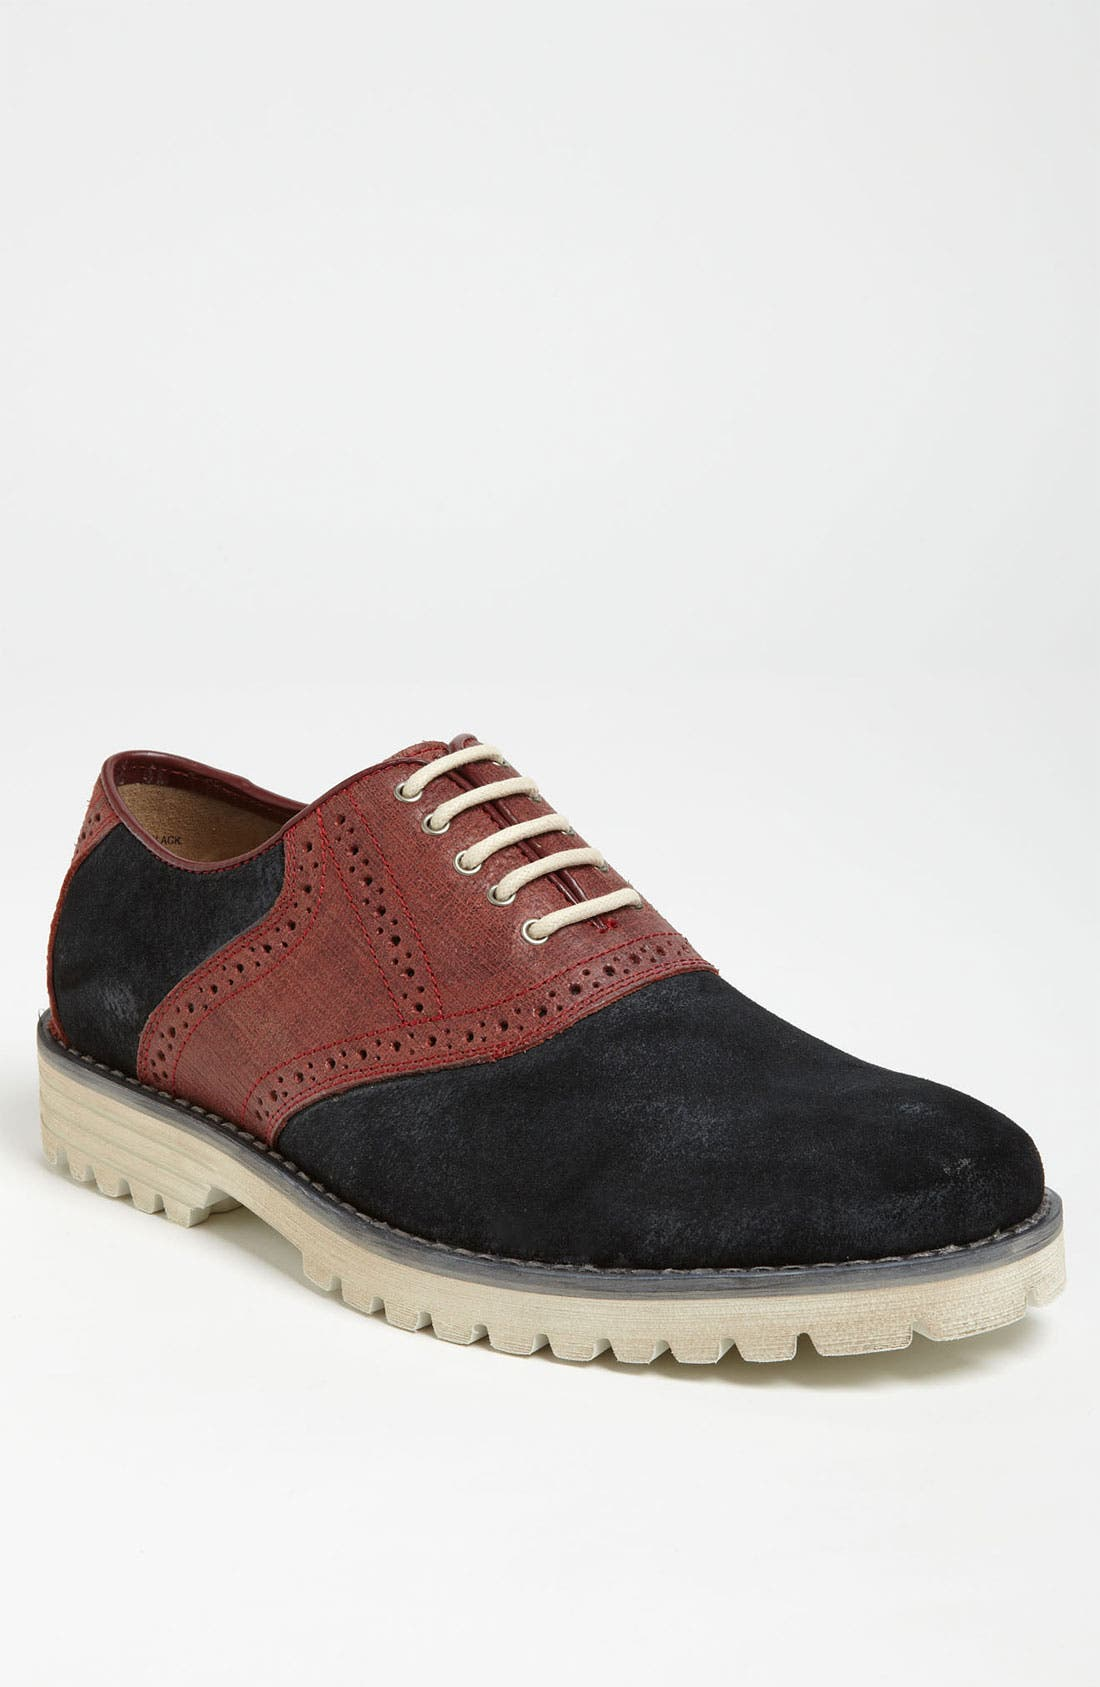 Main Image - Hush Puppies® 'Authentic' Saddle Shoe